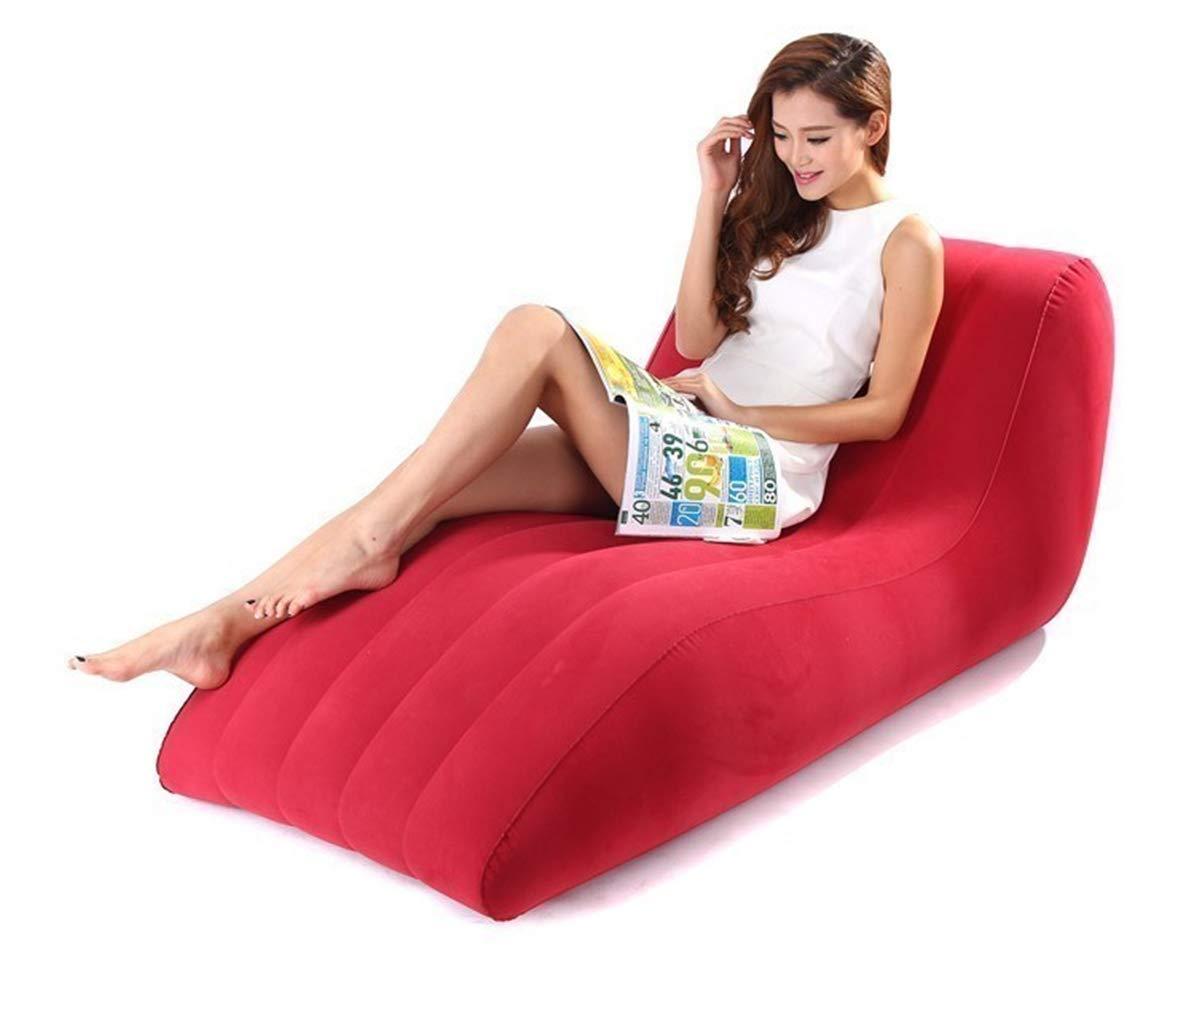 Amazon.com: Gooooolife - Sofá hinchable para adultos, juego ...